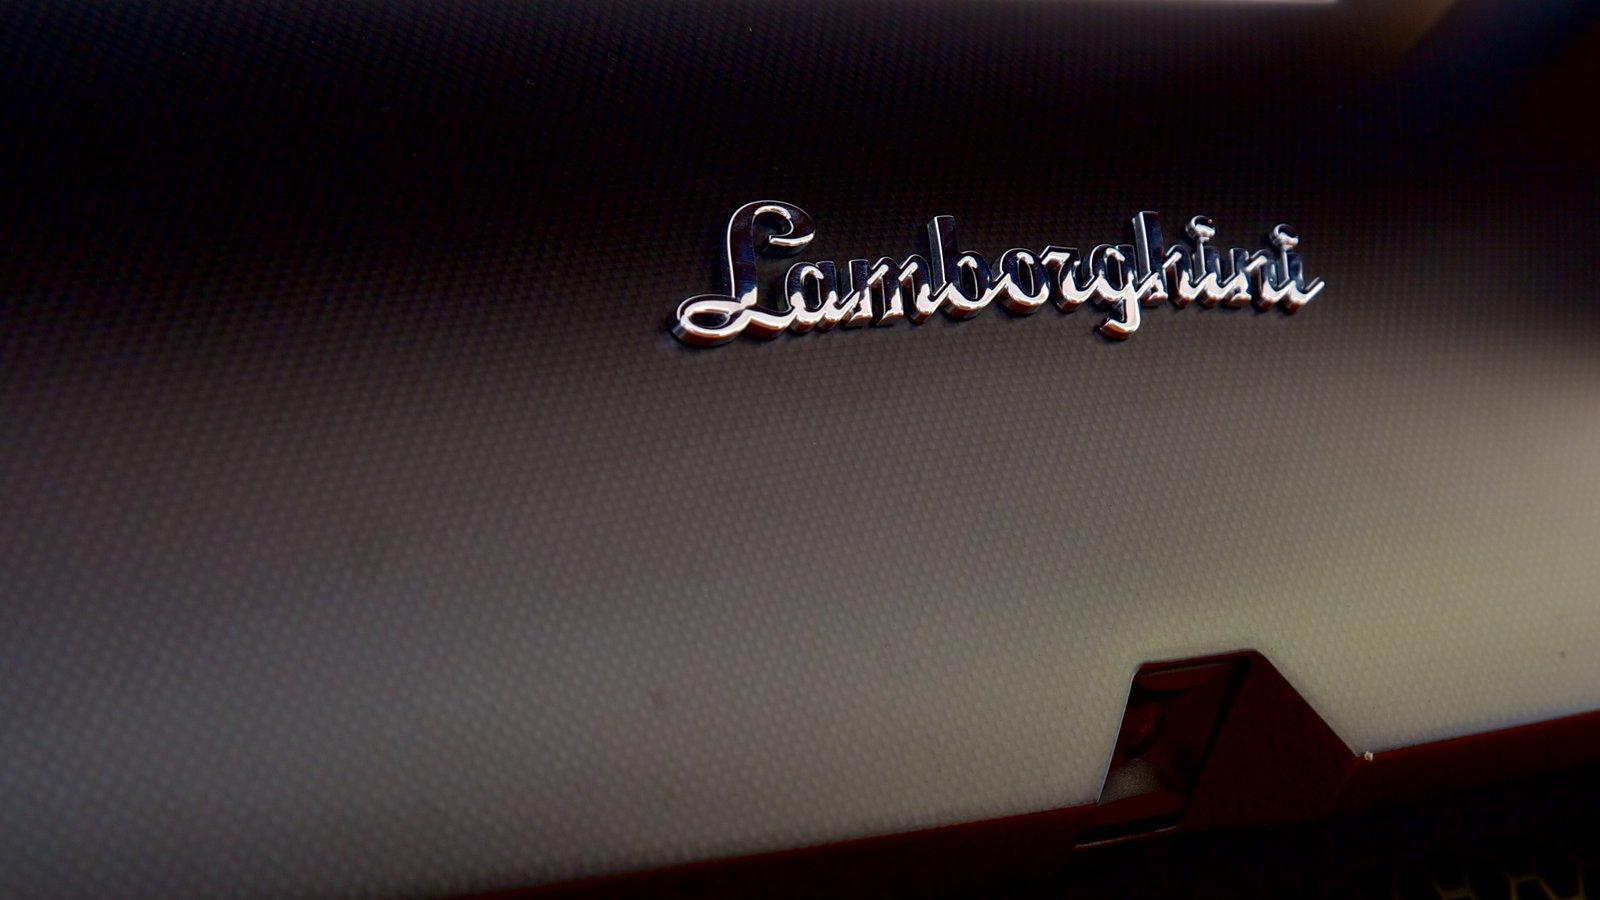 Lamborghini Museum which includes signage